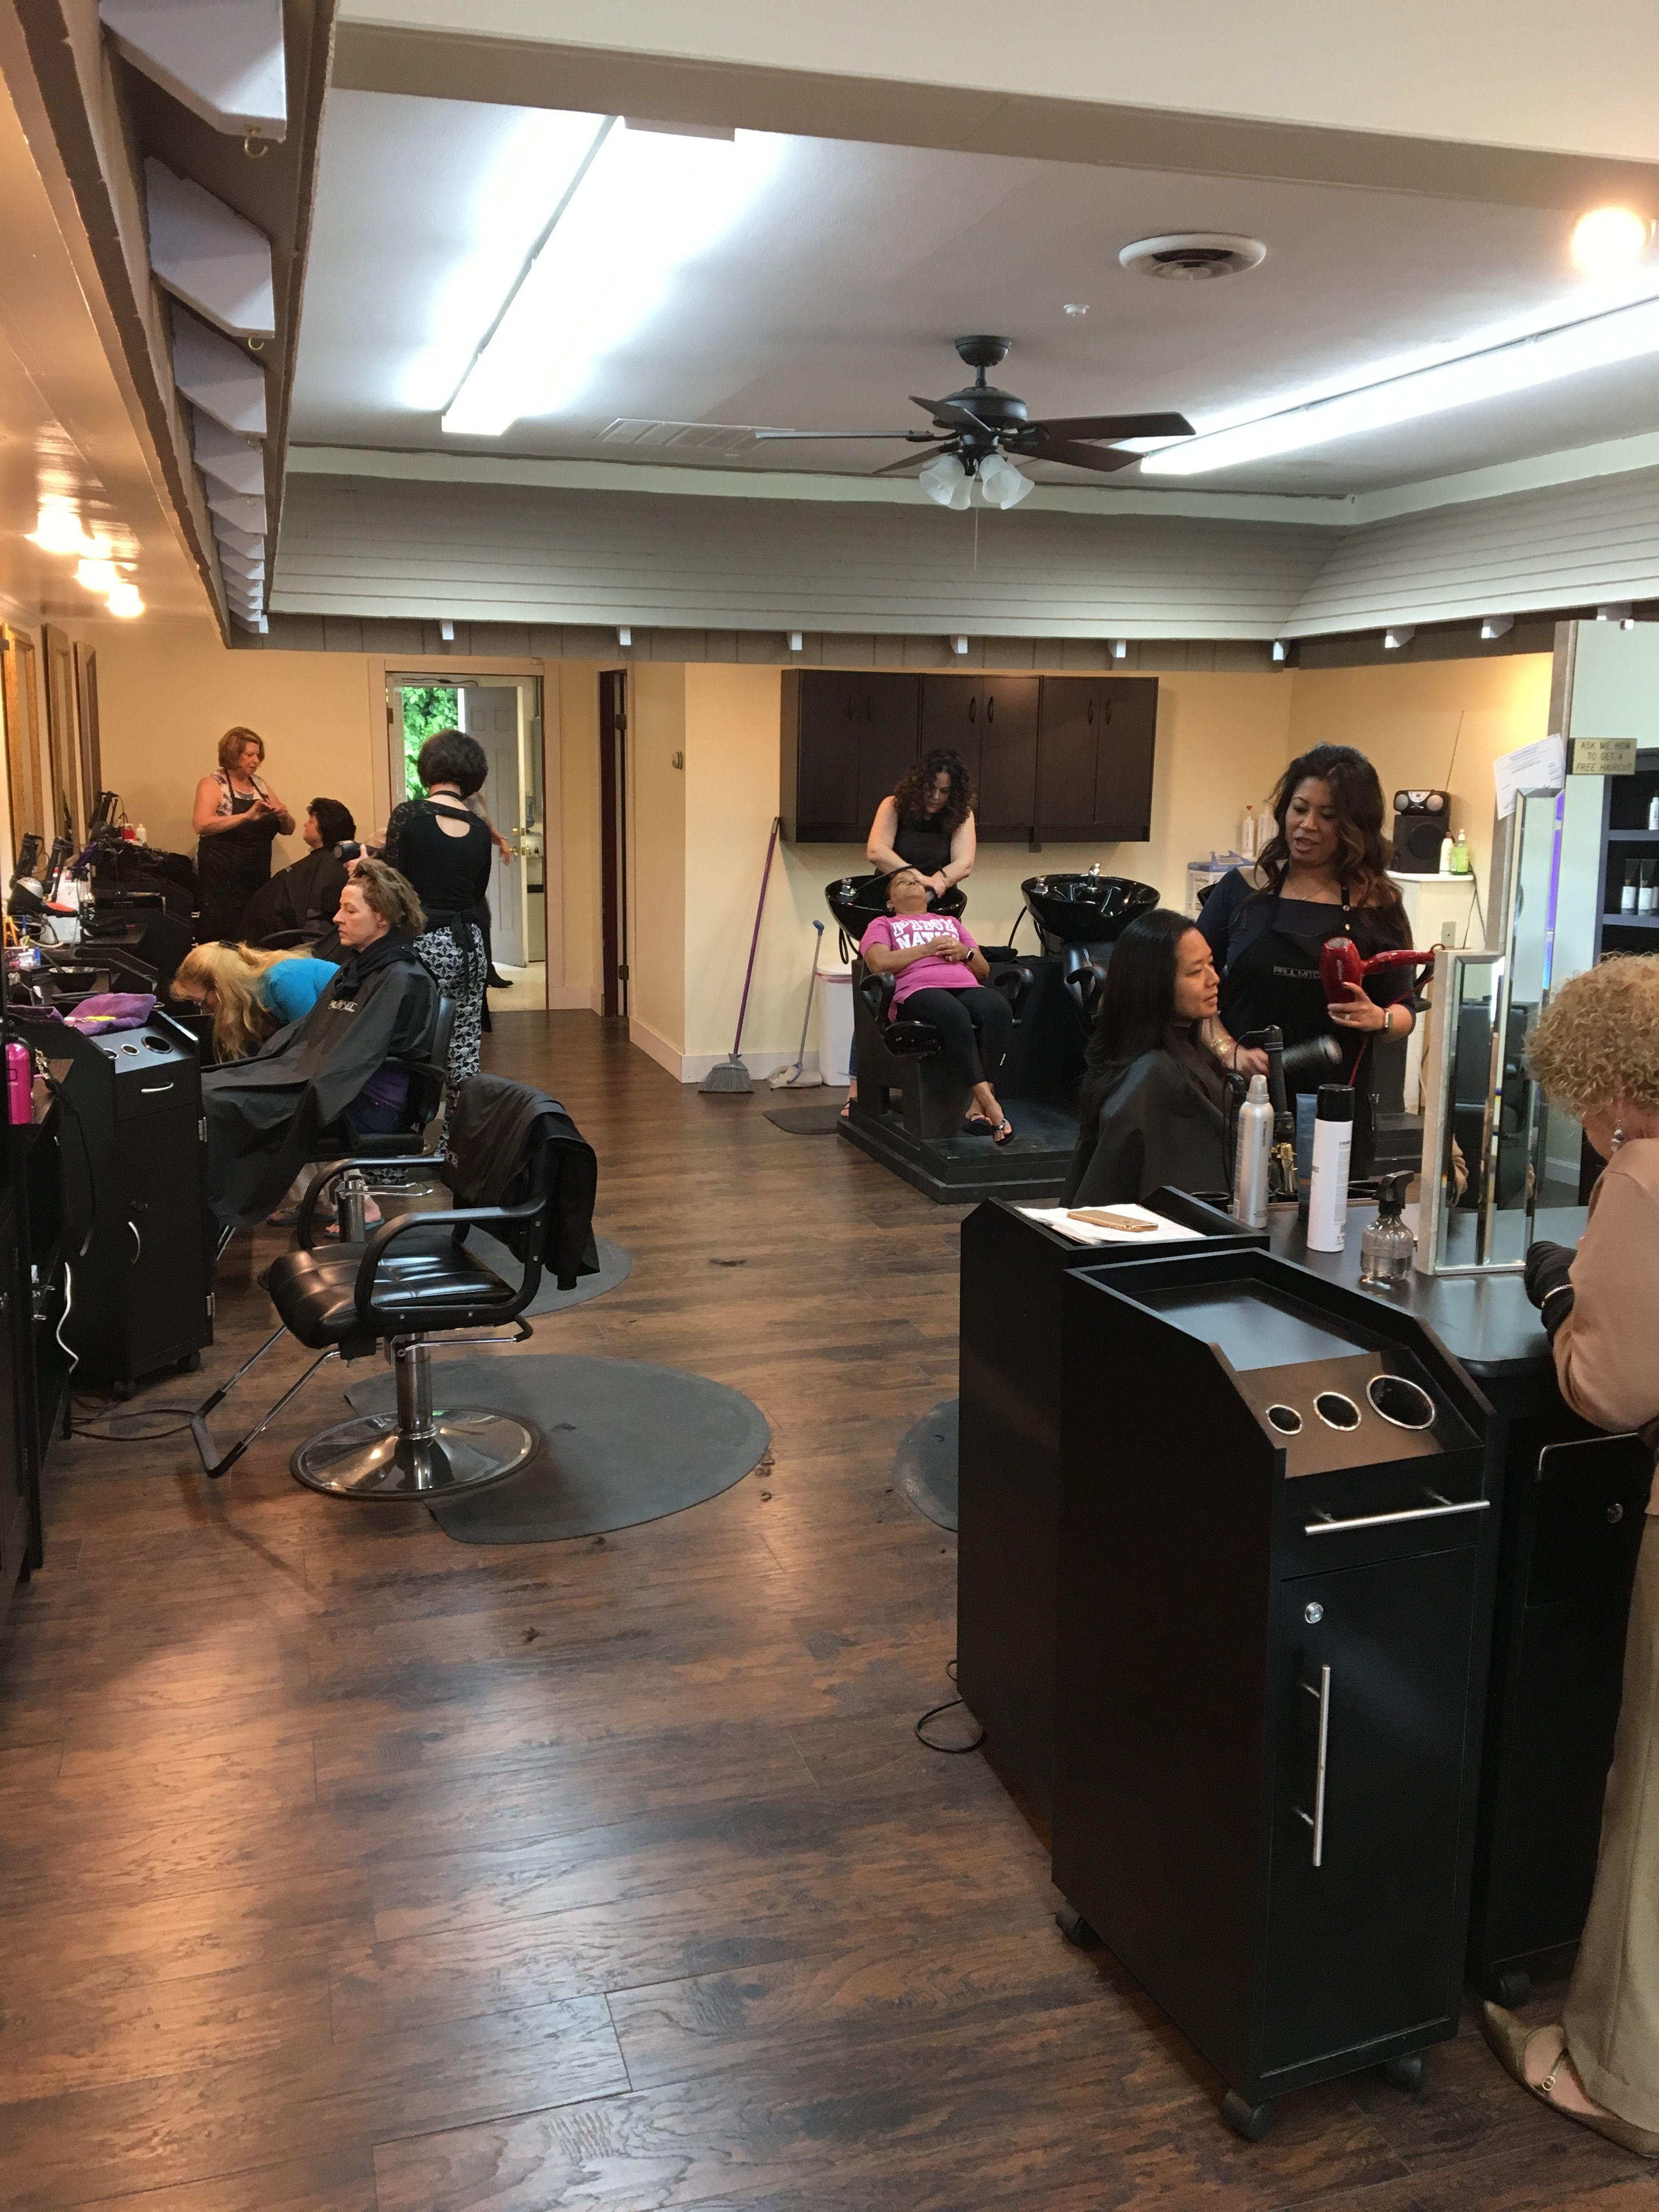 Pin By Shear Elegance Vernon Ct On Shear Elegance Hair Salon Colors And Styles Elegant Hairstyles Hair Salon Hair Color